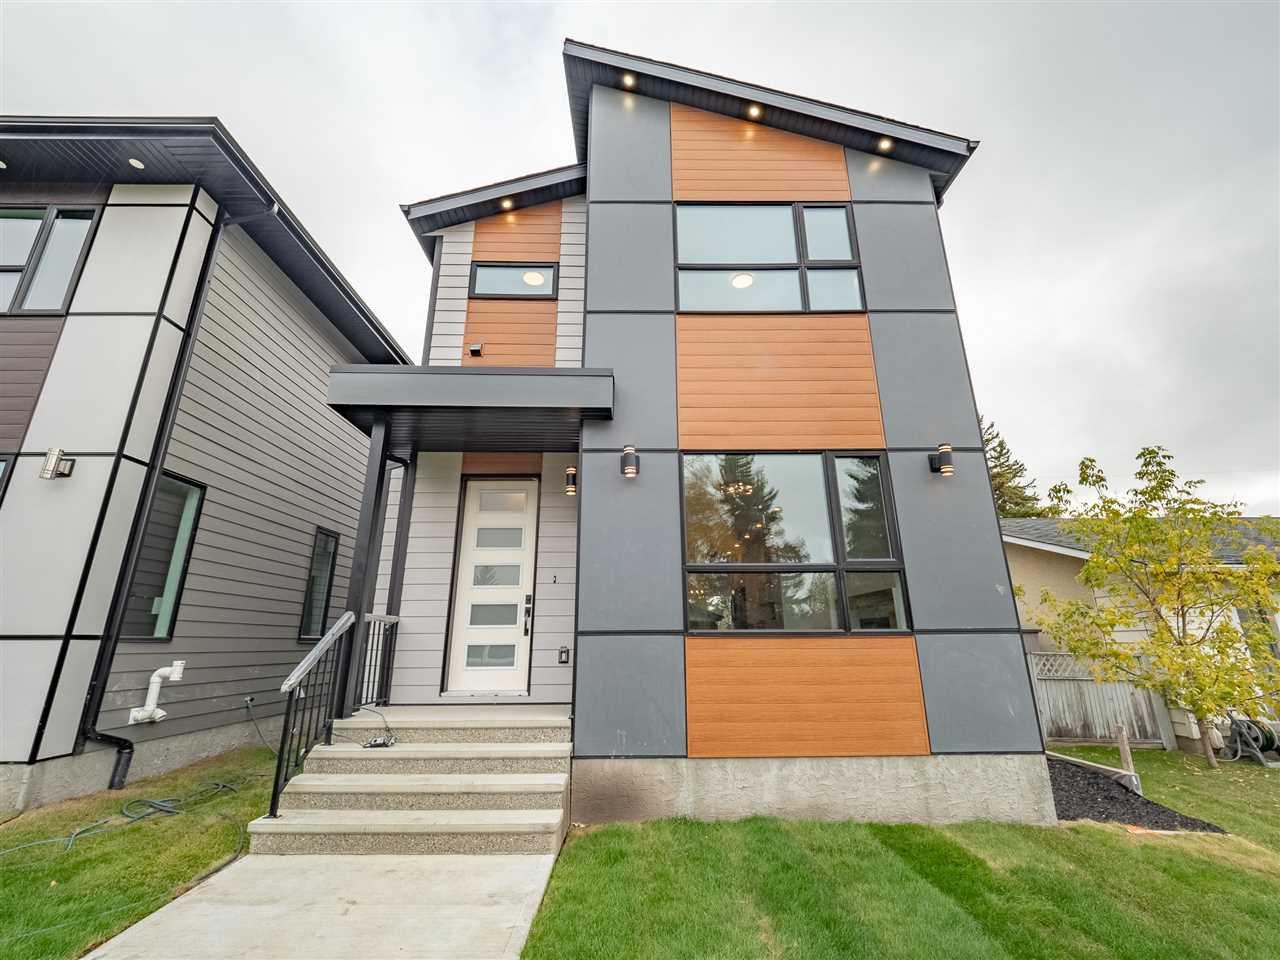 Main Photo: 7903 148 Street in Edmonton: Zone 10 House for sale : MLS®# E4175673